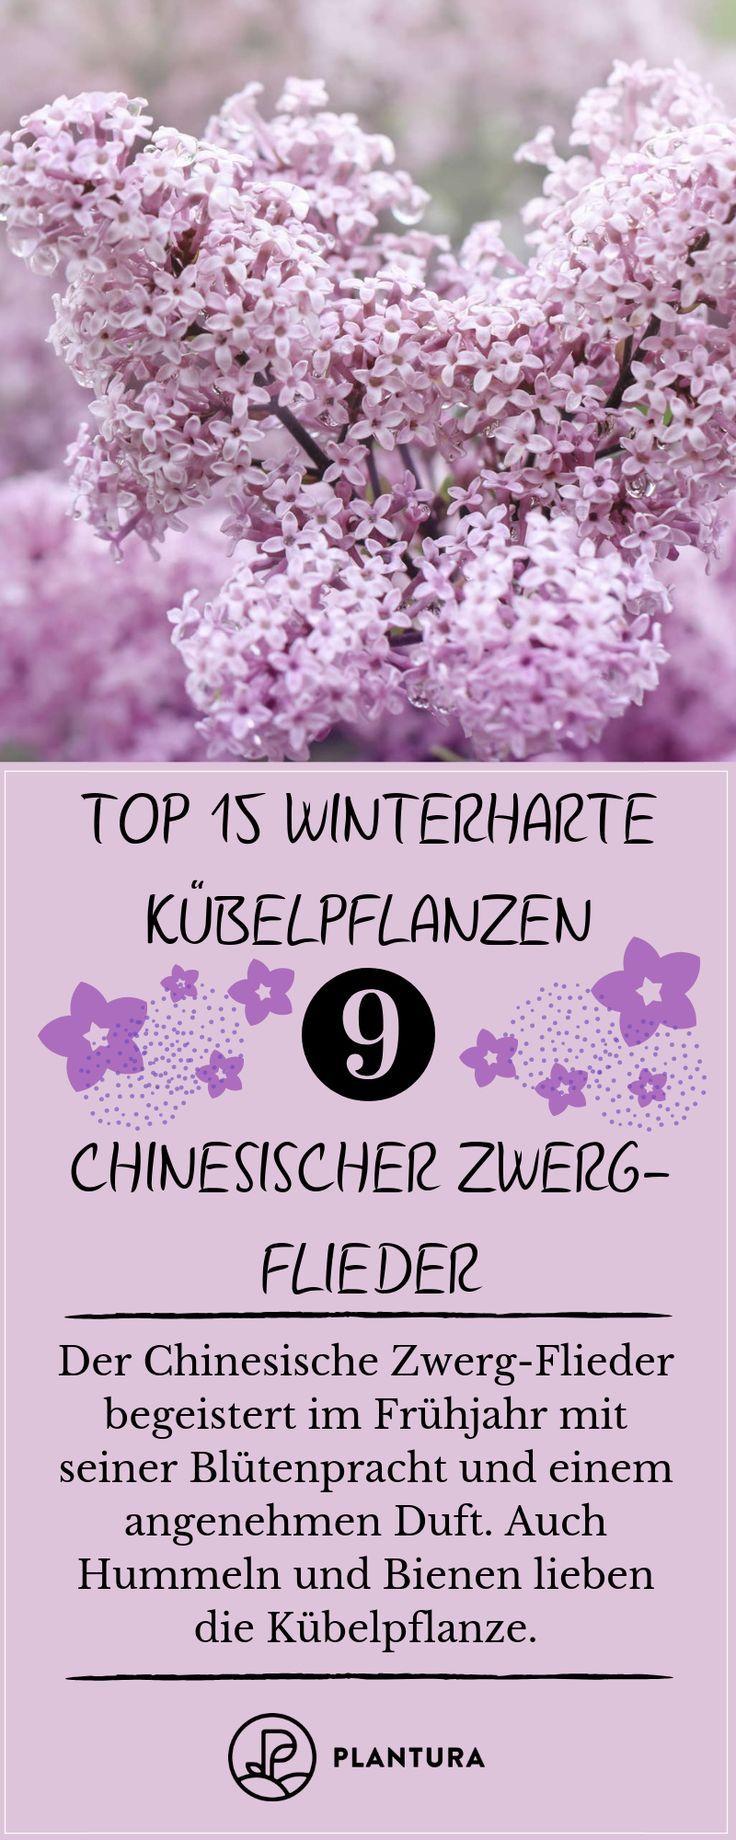 Winterharte k belpflanzen unsere top 15 urban gardening for Topfpflanzen winterhart